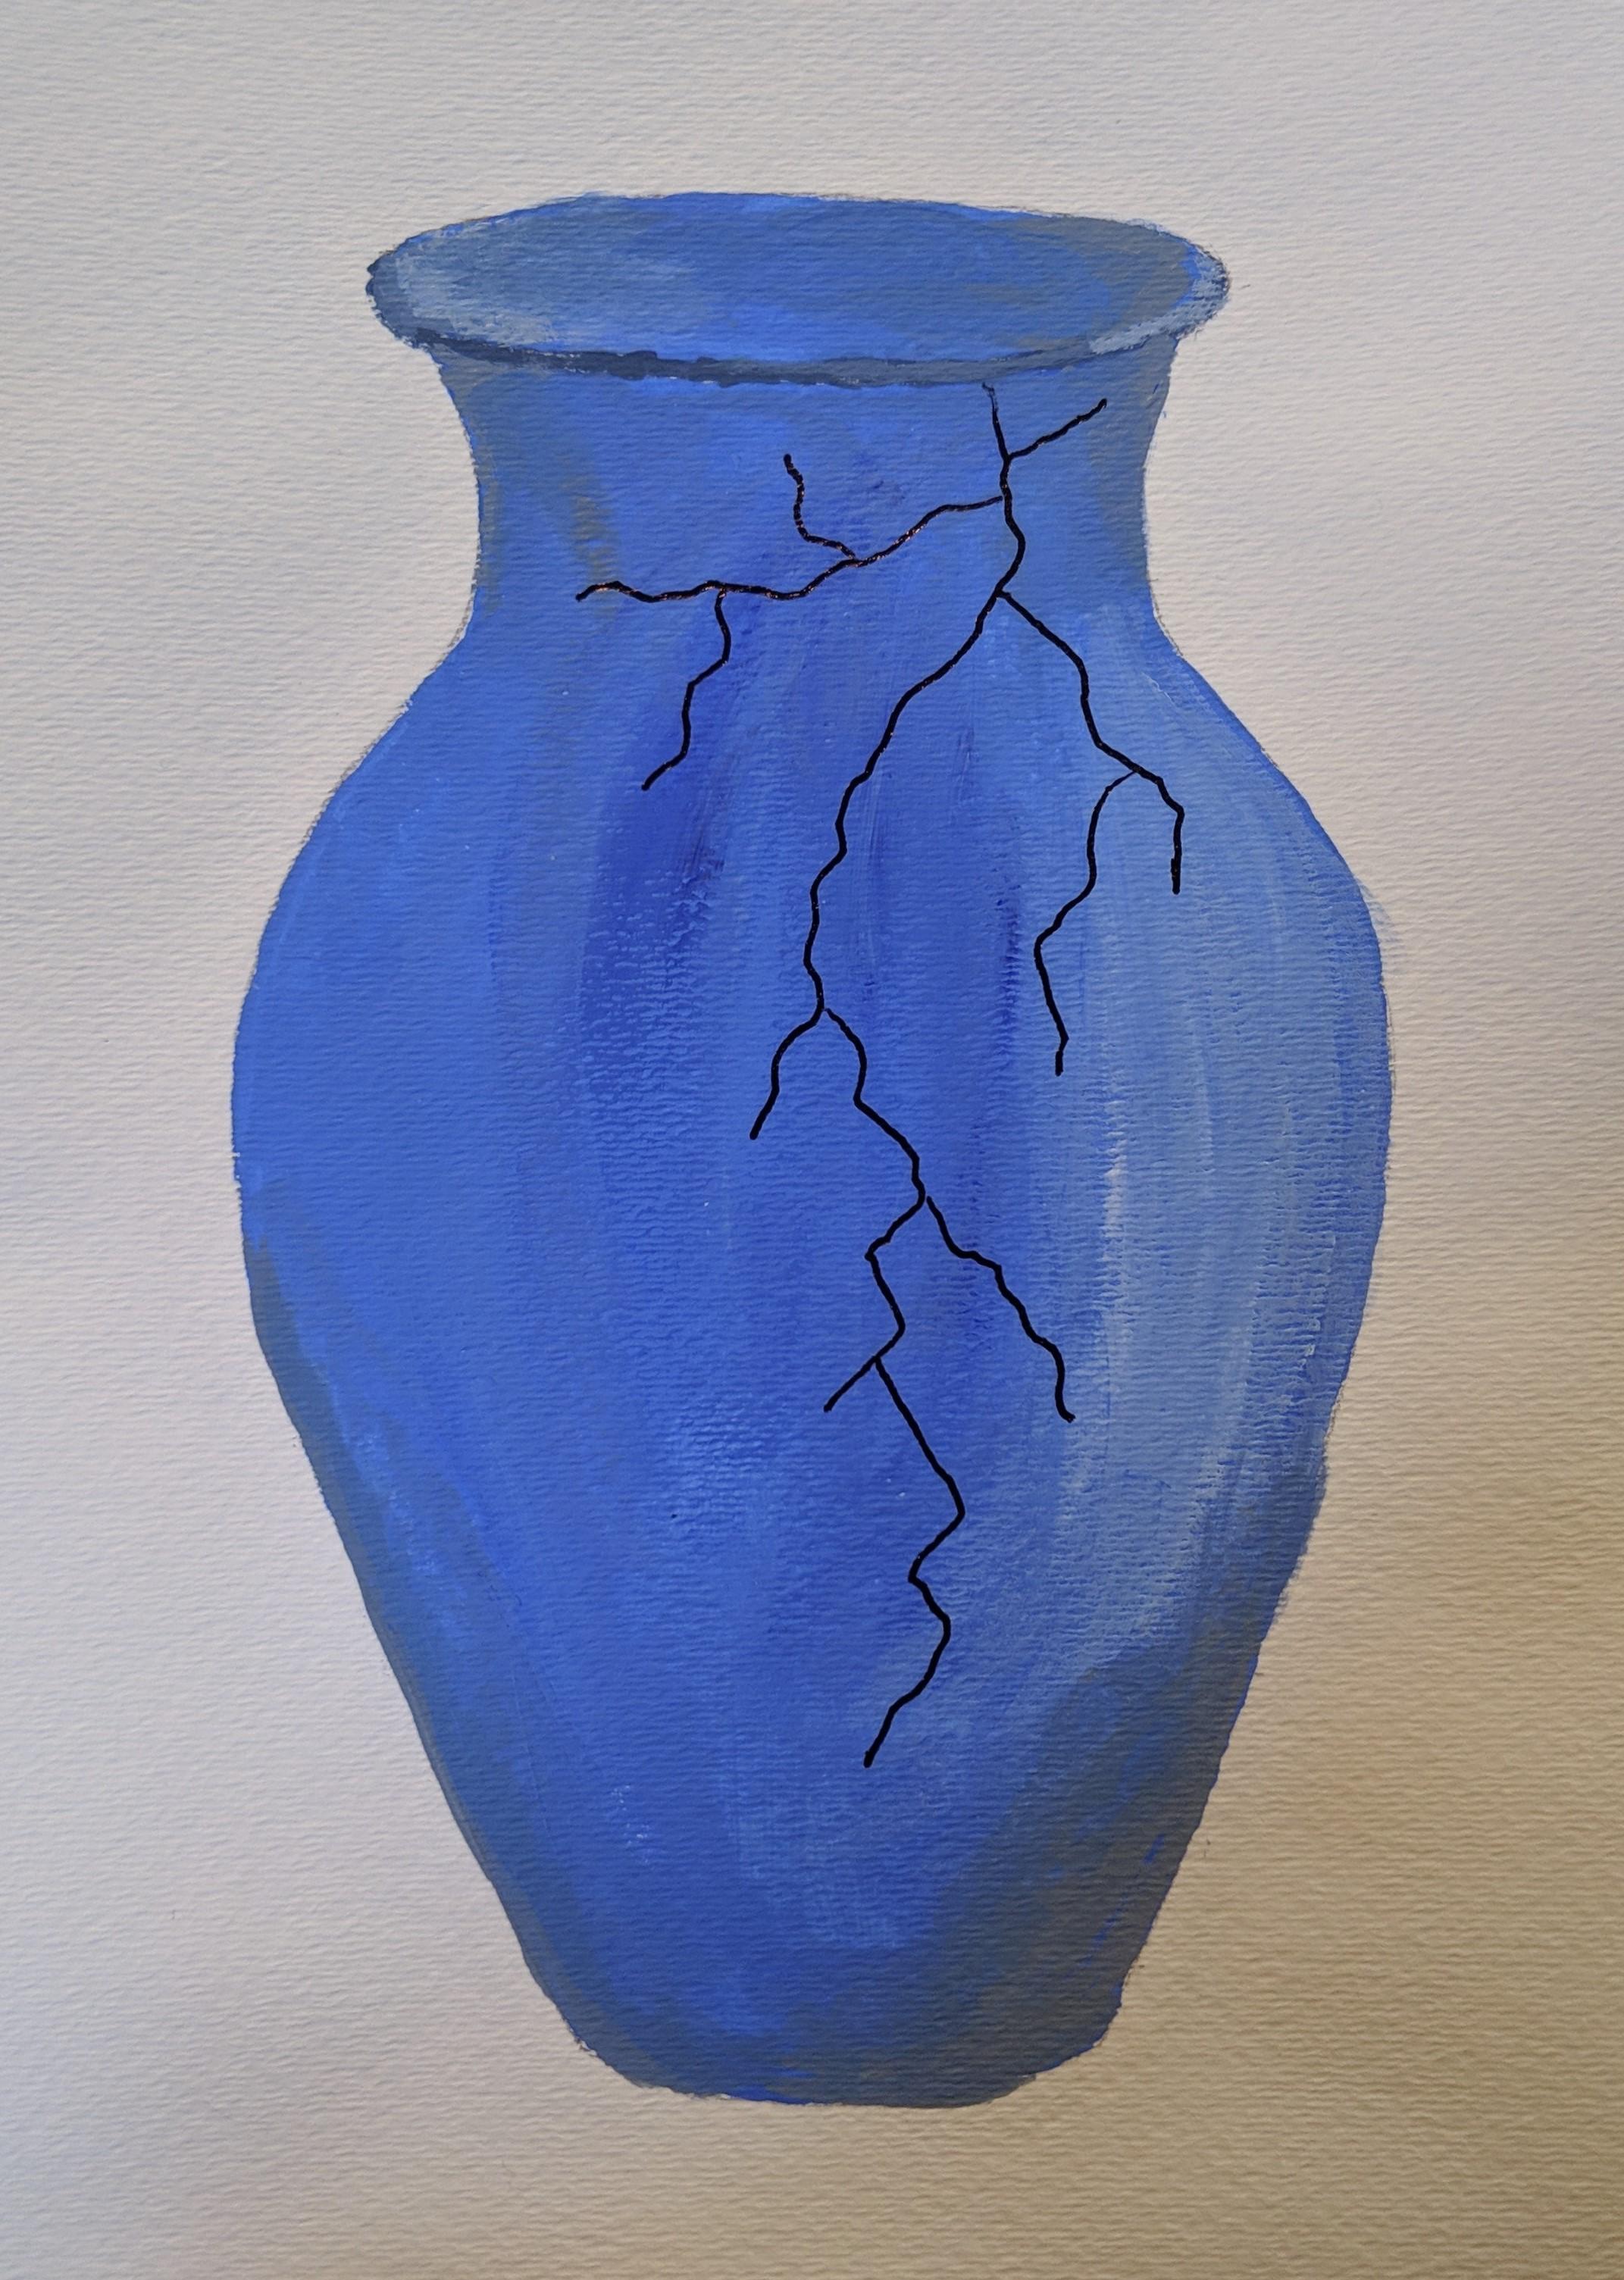 cropped 2nd kintsugi vase with cracks no gold20190828_181845